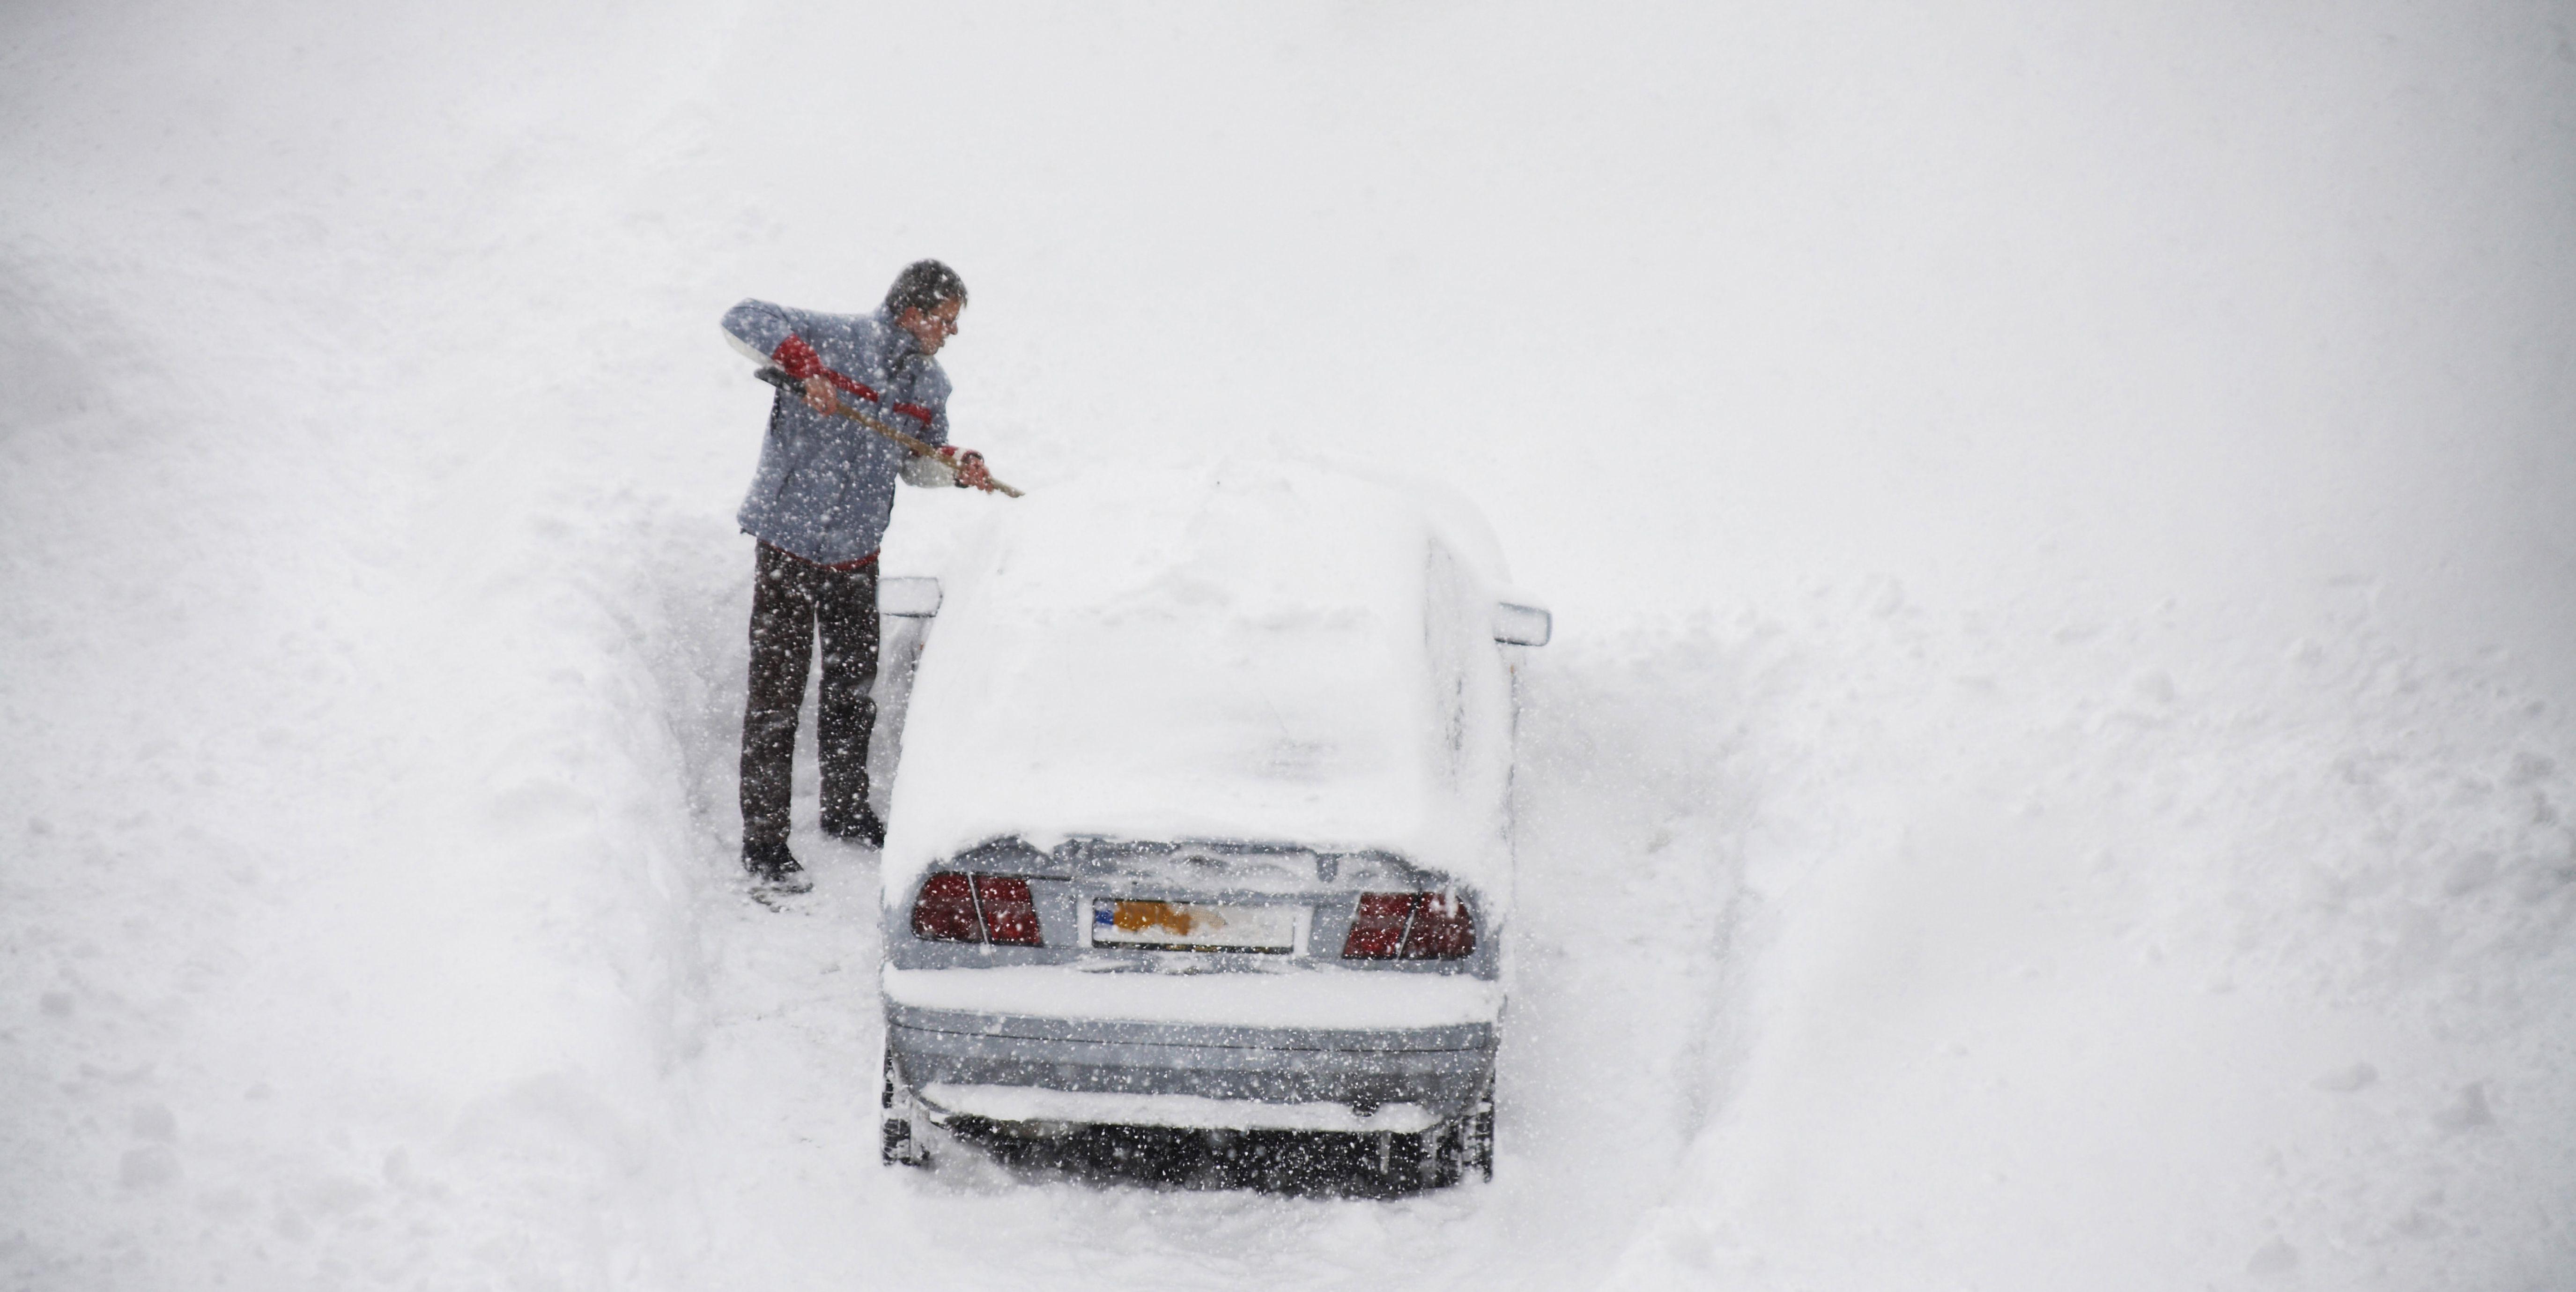 farmers almanac winter 2018-19 forecast